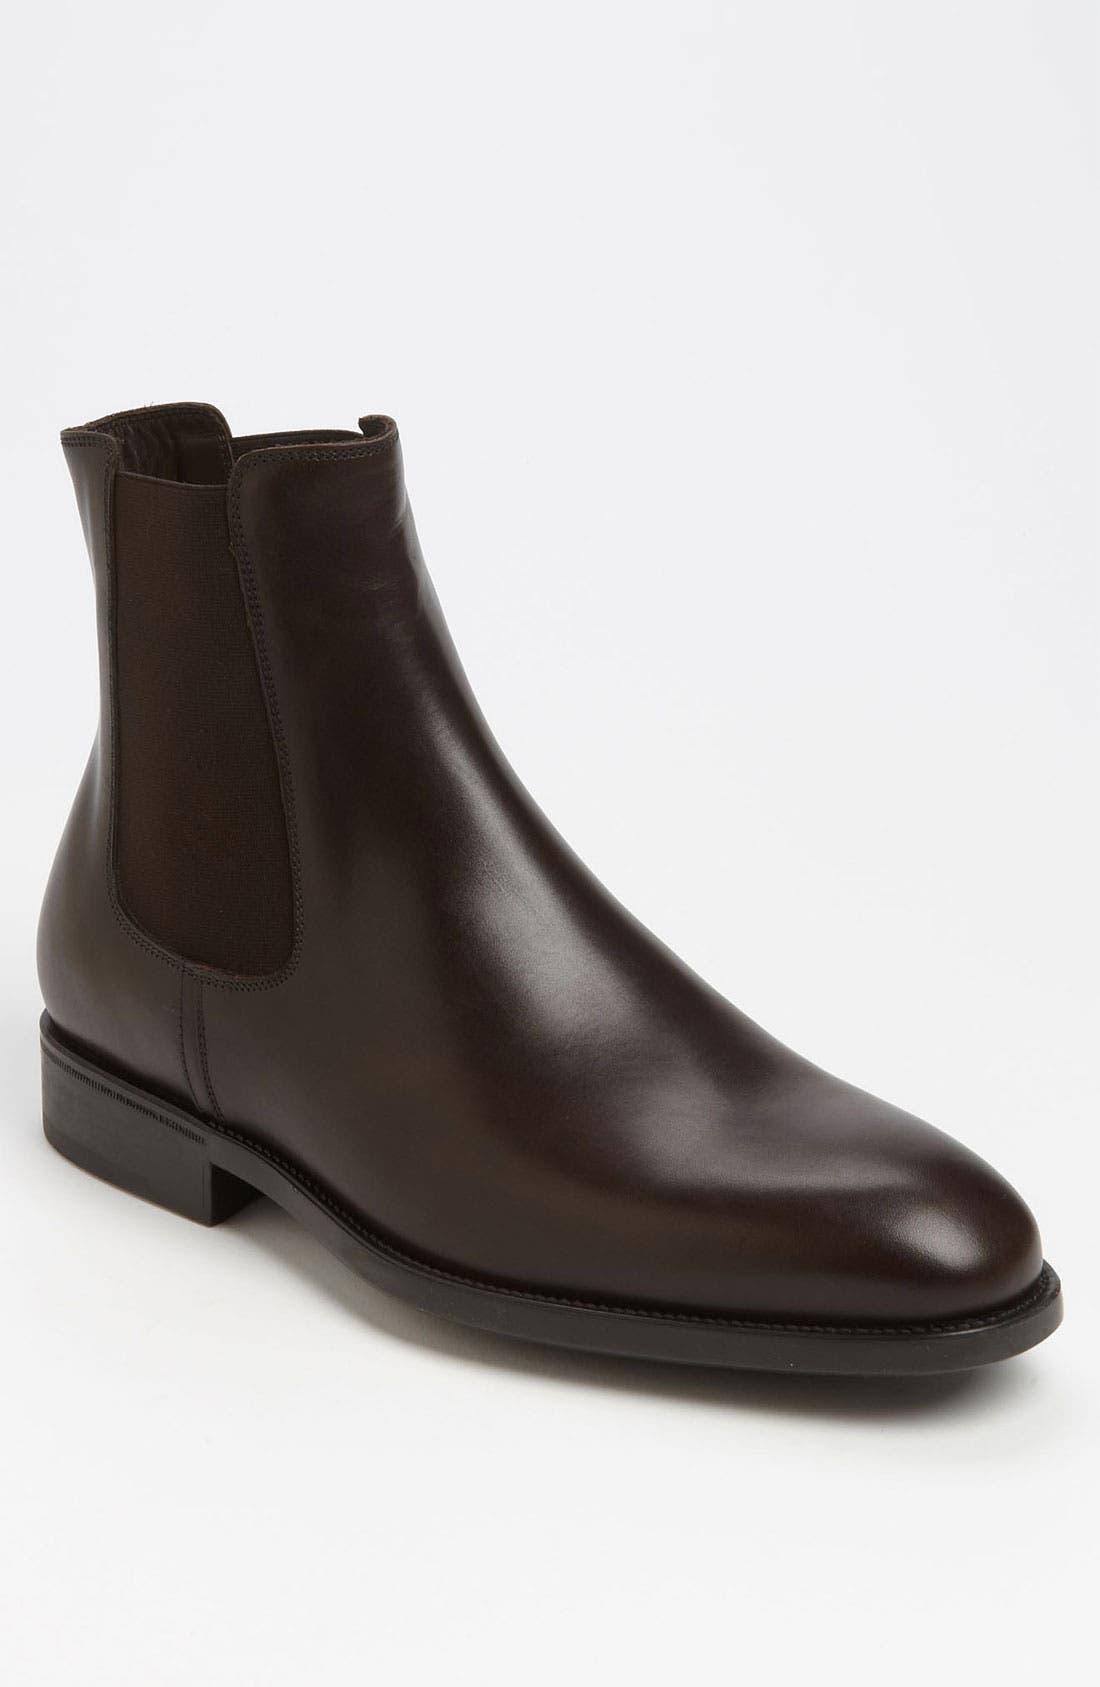 Alternate Image 1 Selected - Salvatore Ferragamo 'Arden' Chelsea Boot